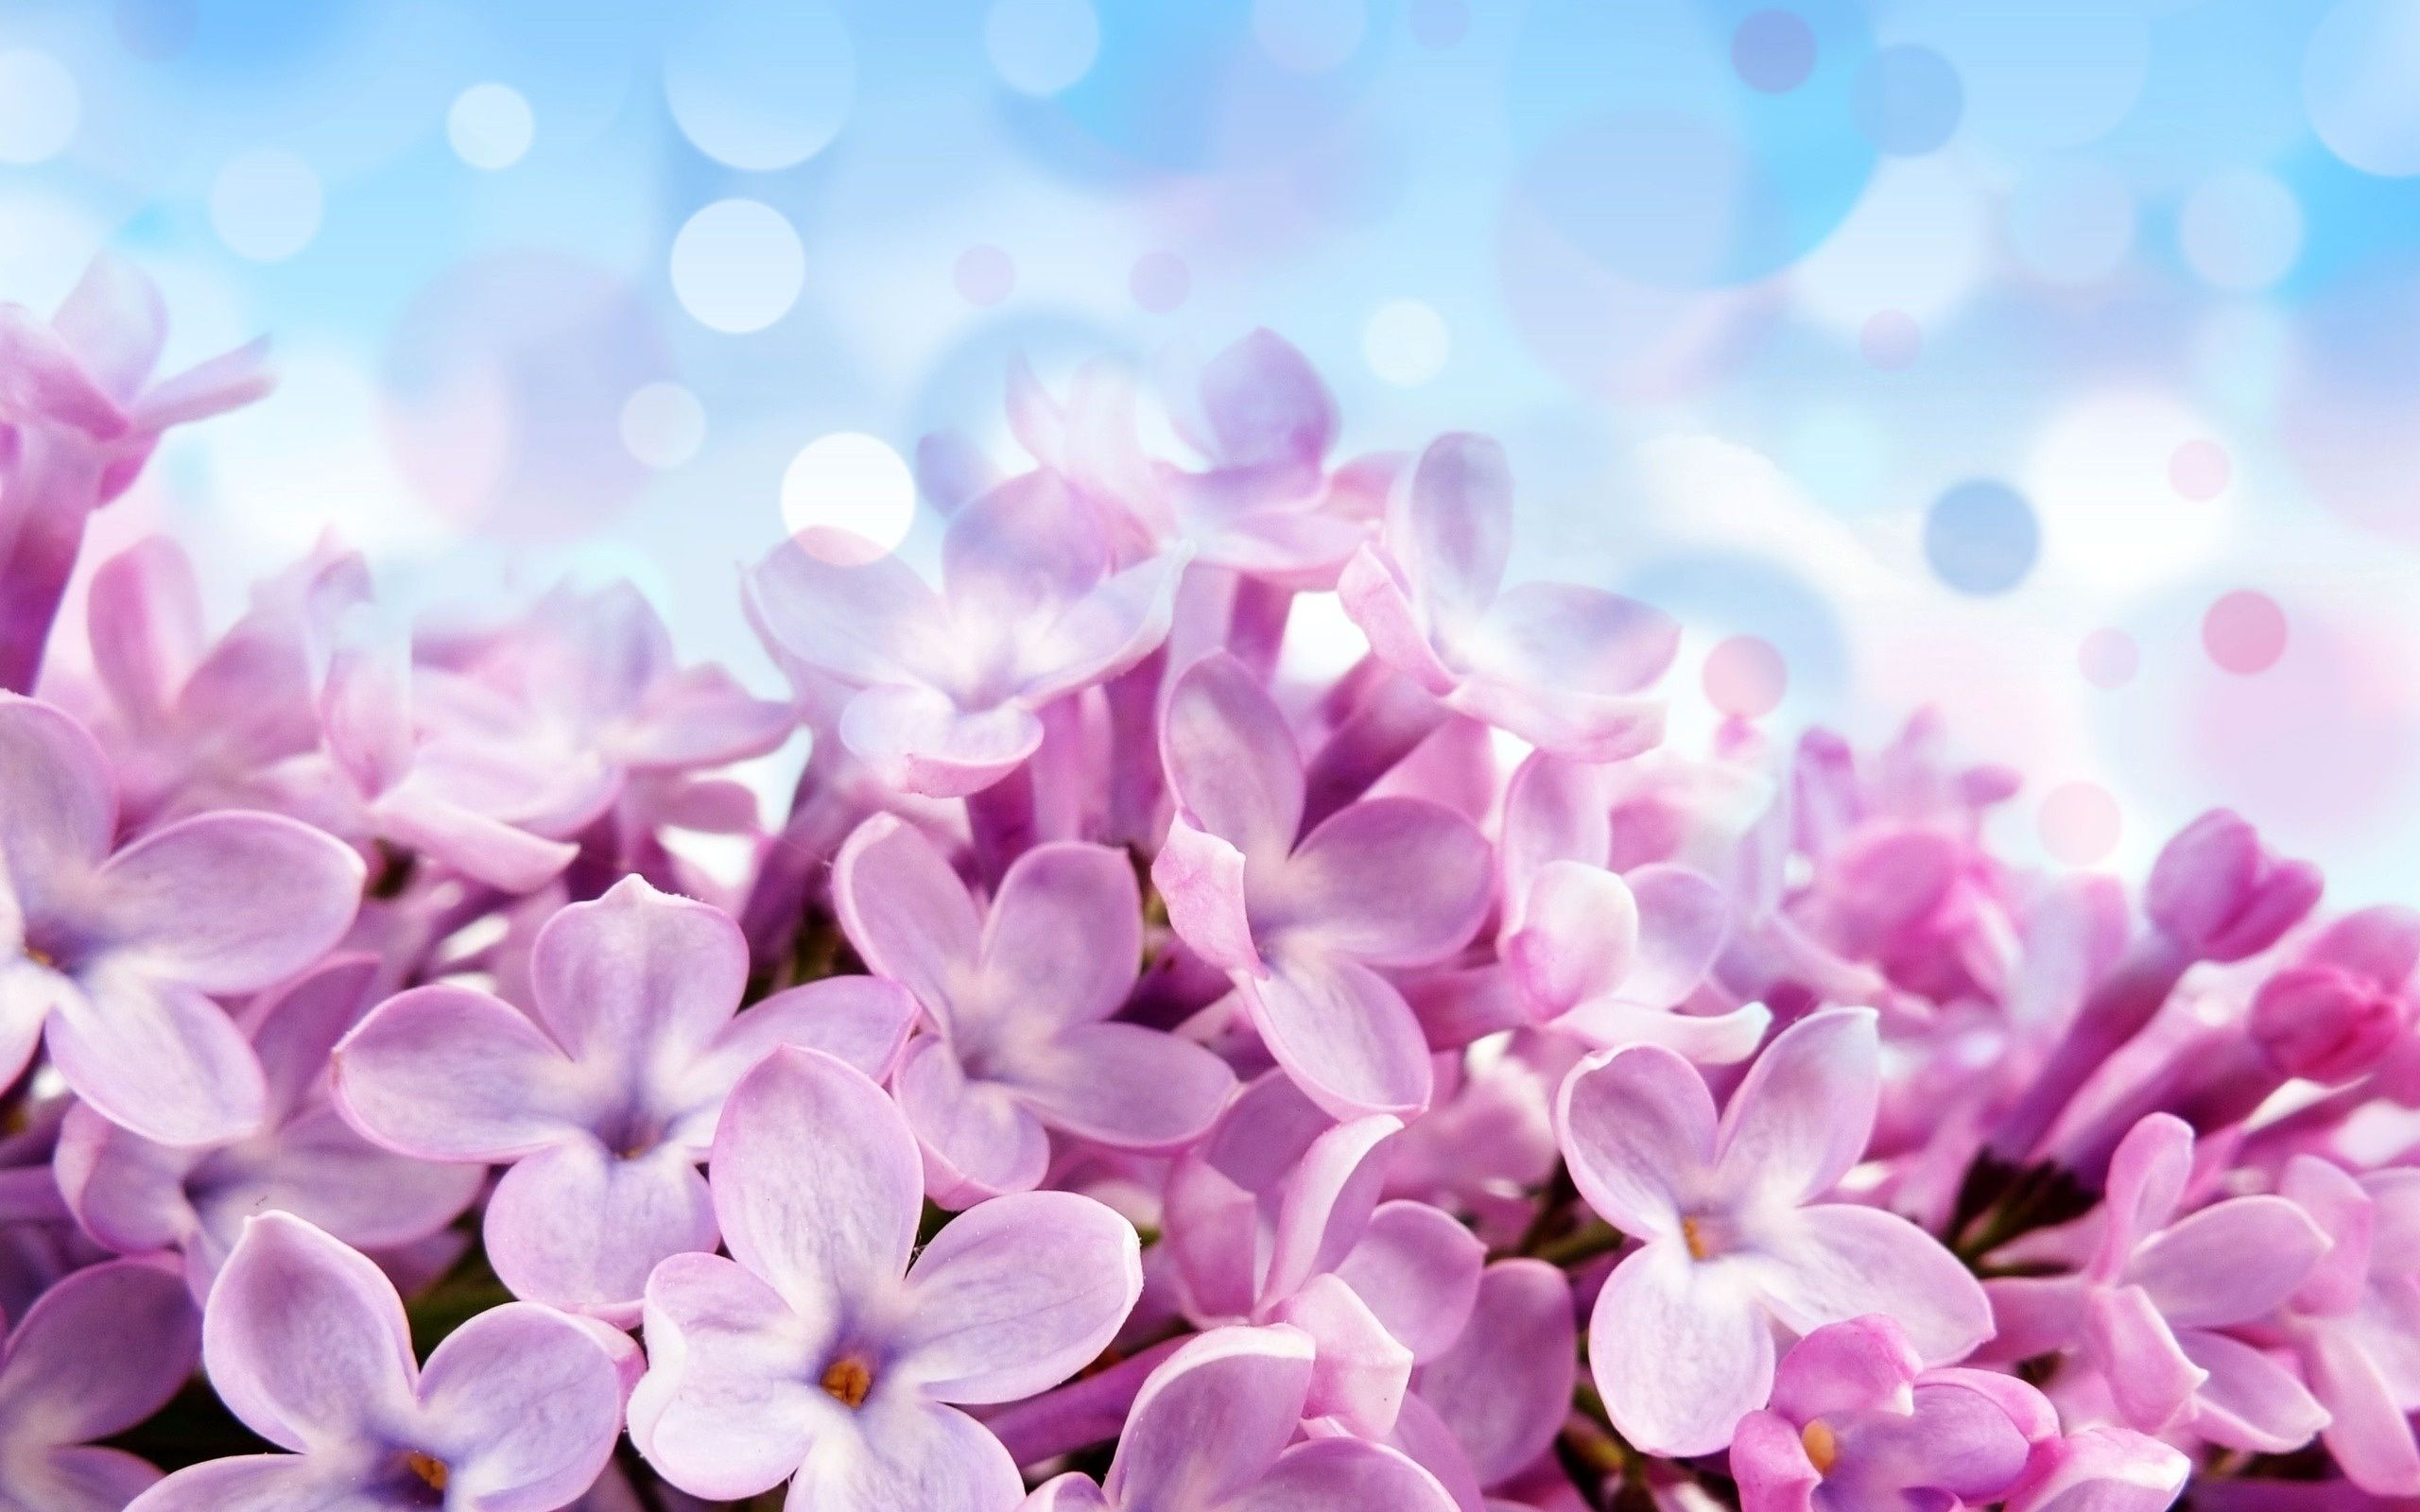 Purple Photo Lilac Flower Free Flower Wallpaper Flower Wallpaper Flowers